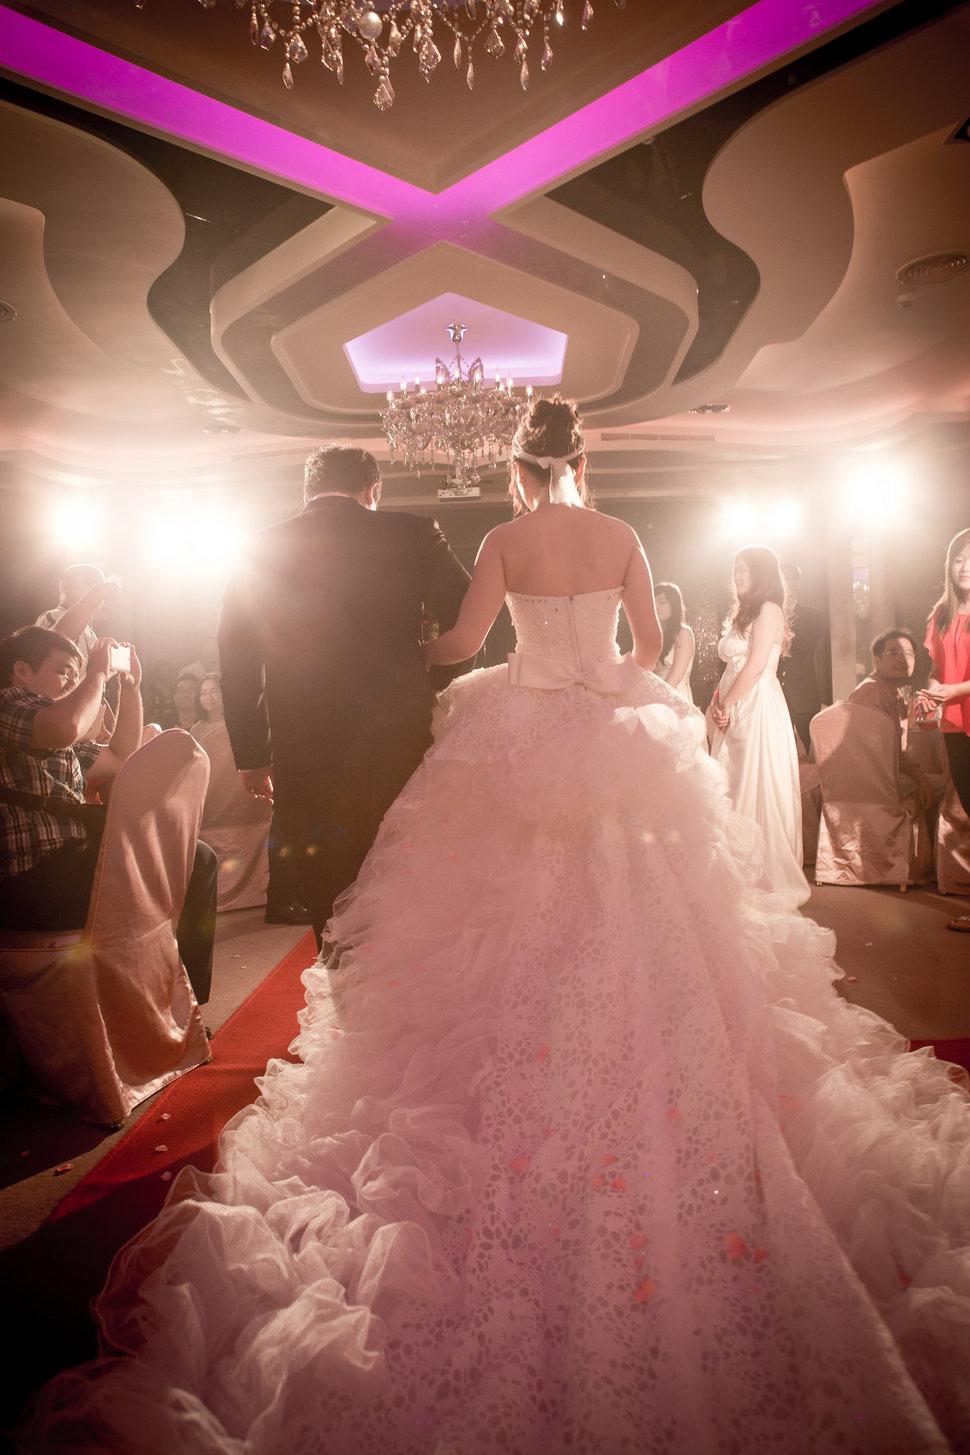 18PHOTO-爵名❤️ 瓊文(編號:220384) - 18PHOTO 婚紗影像攝影工作室 - 結婚吧